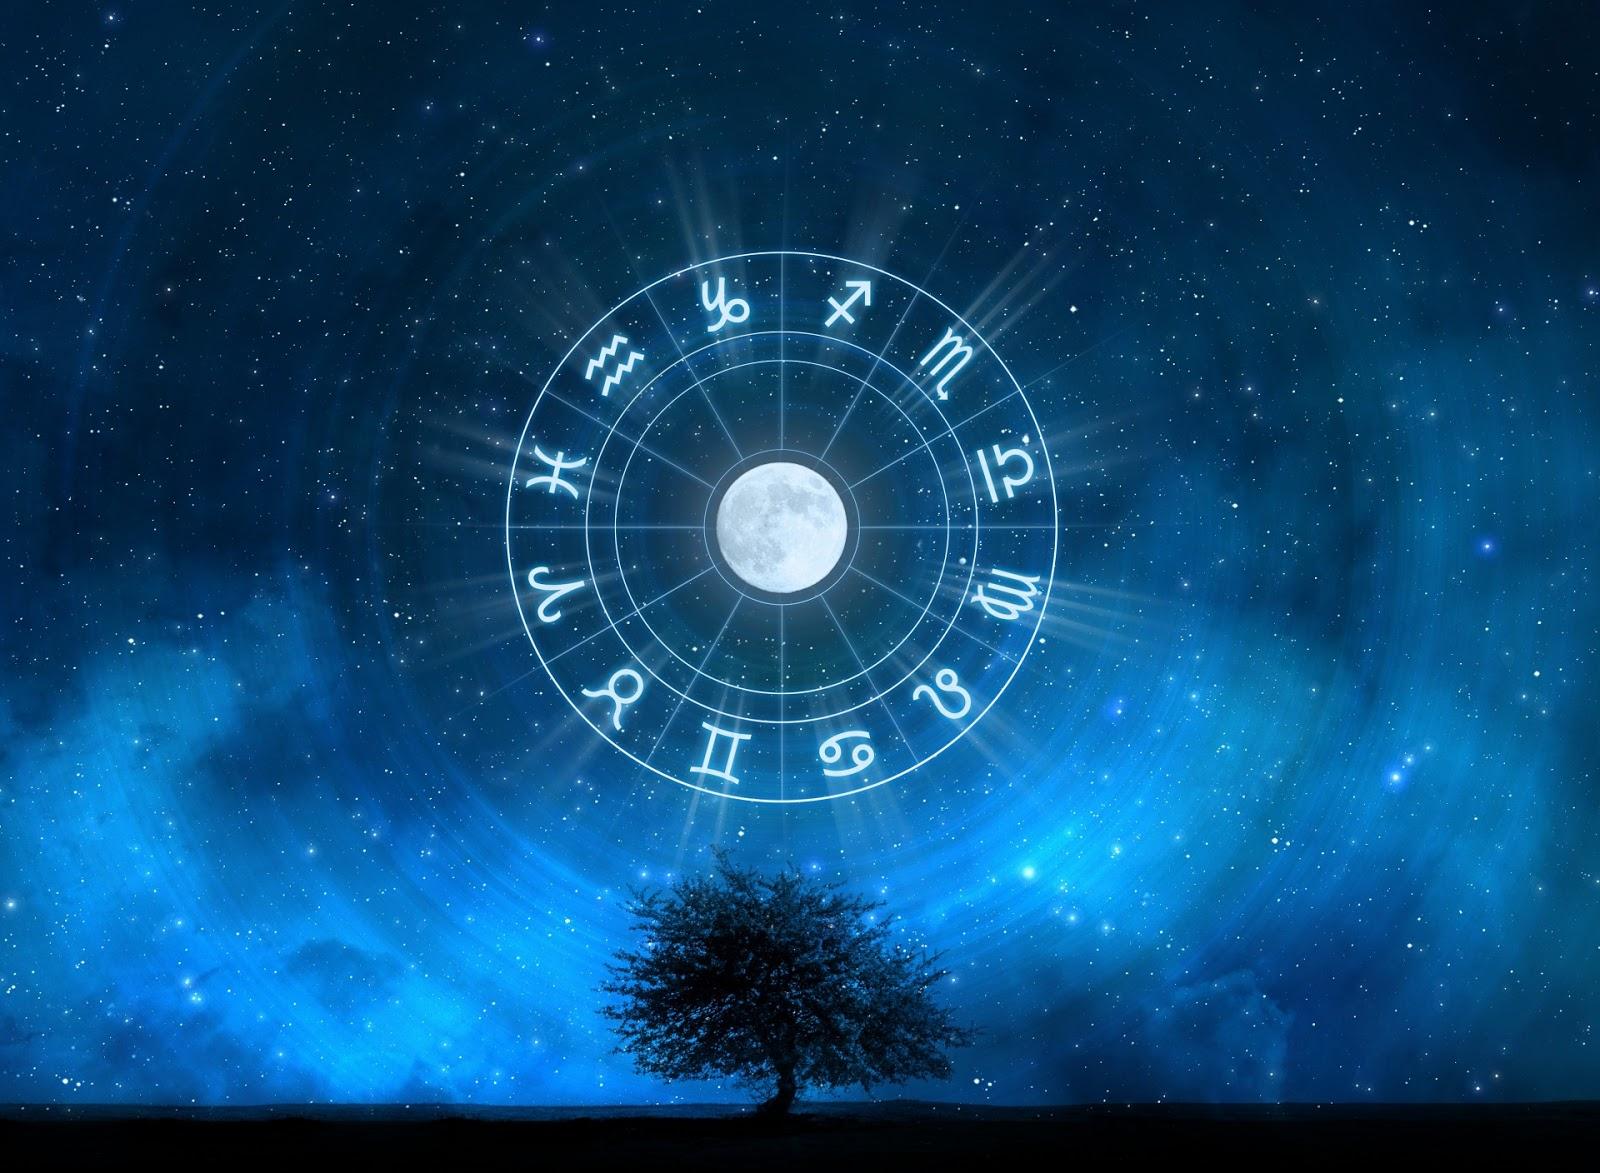 http://2.bp.blogspot.com/-VzKyEY2ohNw/UPoWFQGMqJI/AAAAAAAAJV0/5B-VPzjiu2A/s1600/Zodiac-signs-on-the-sky-HD-wallpaper_1920x1408.jpg